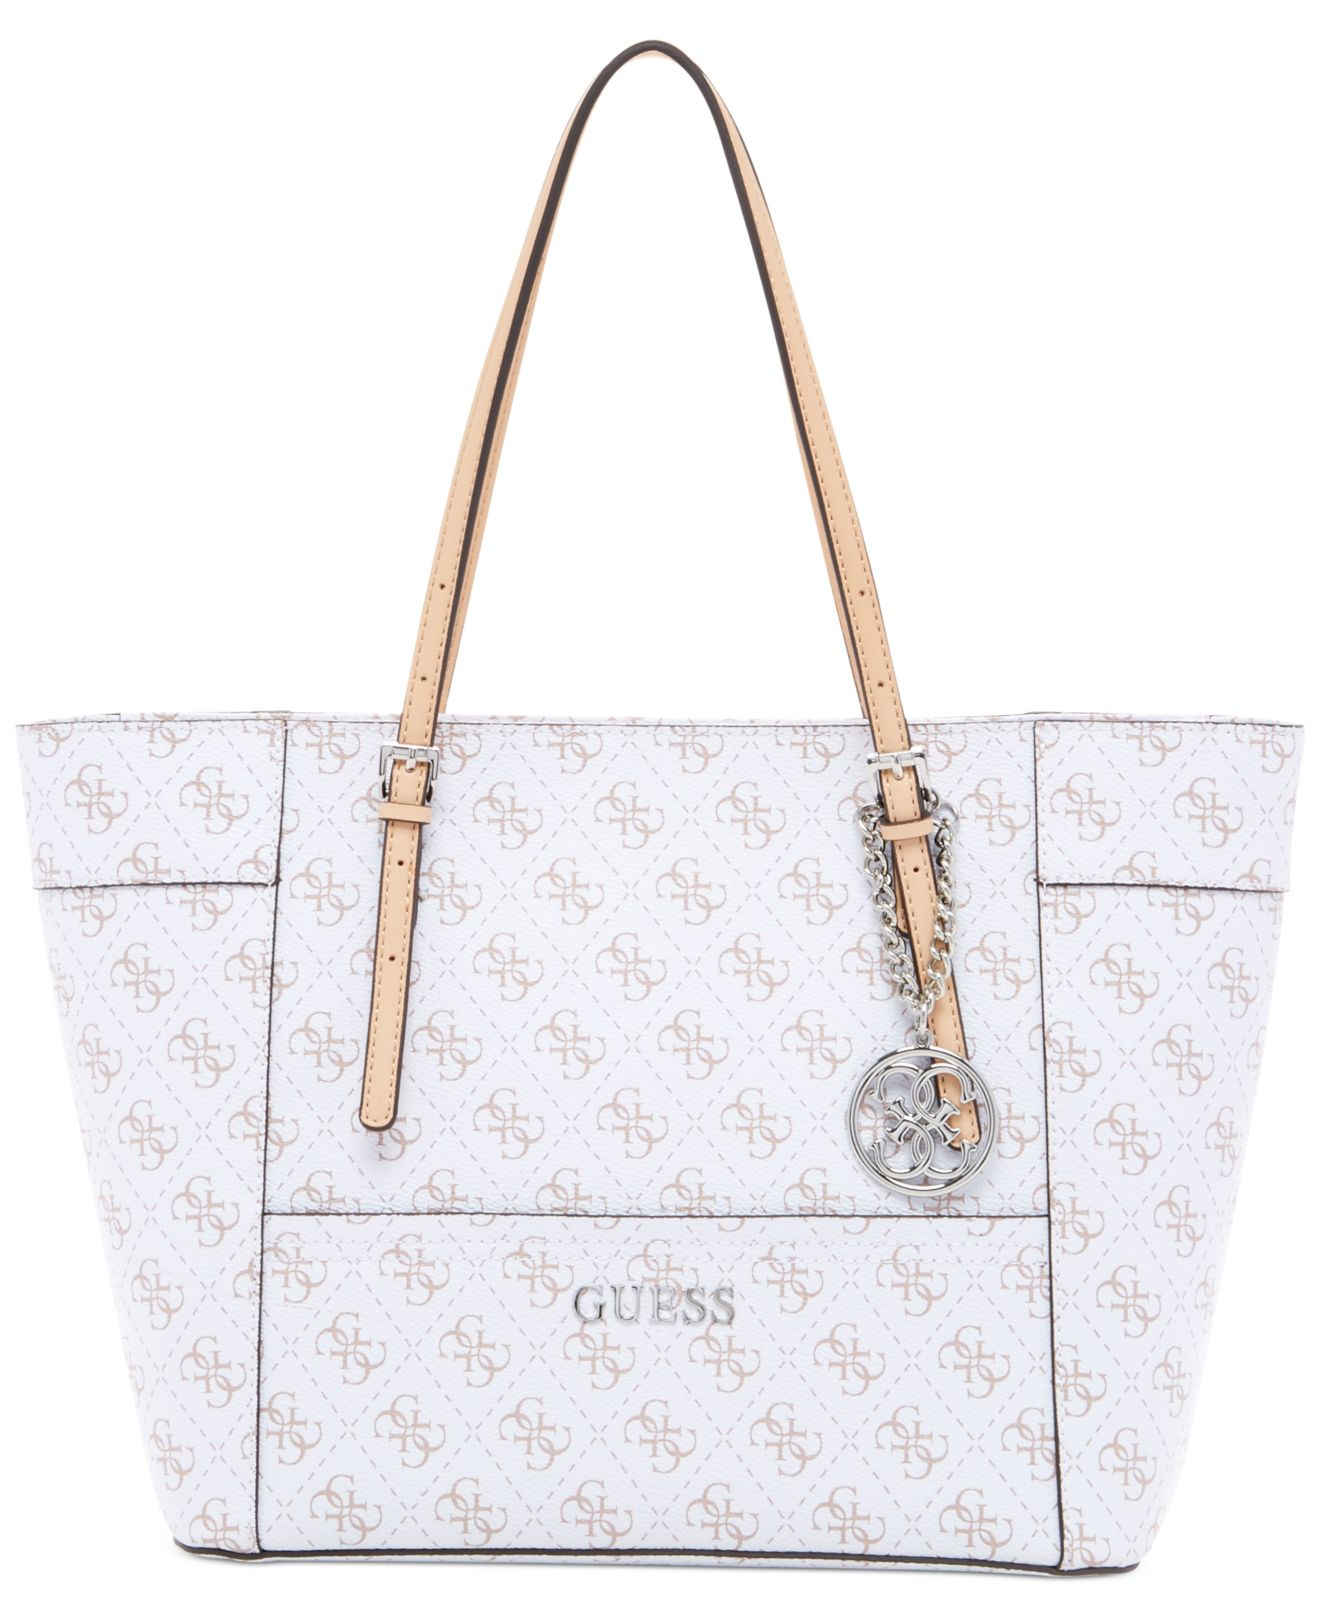 dec4a2805d52 Guess Tote Bag For Women White Gs669123 Whi Souq Uae